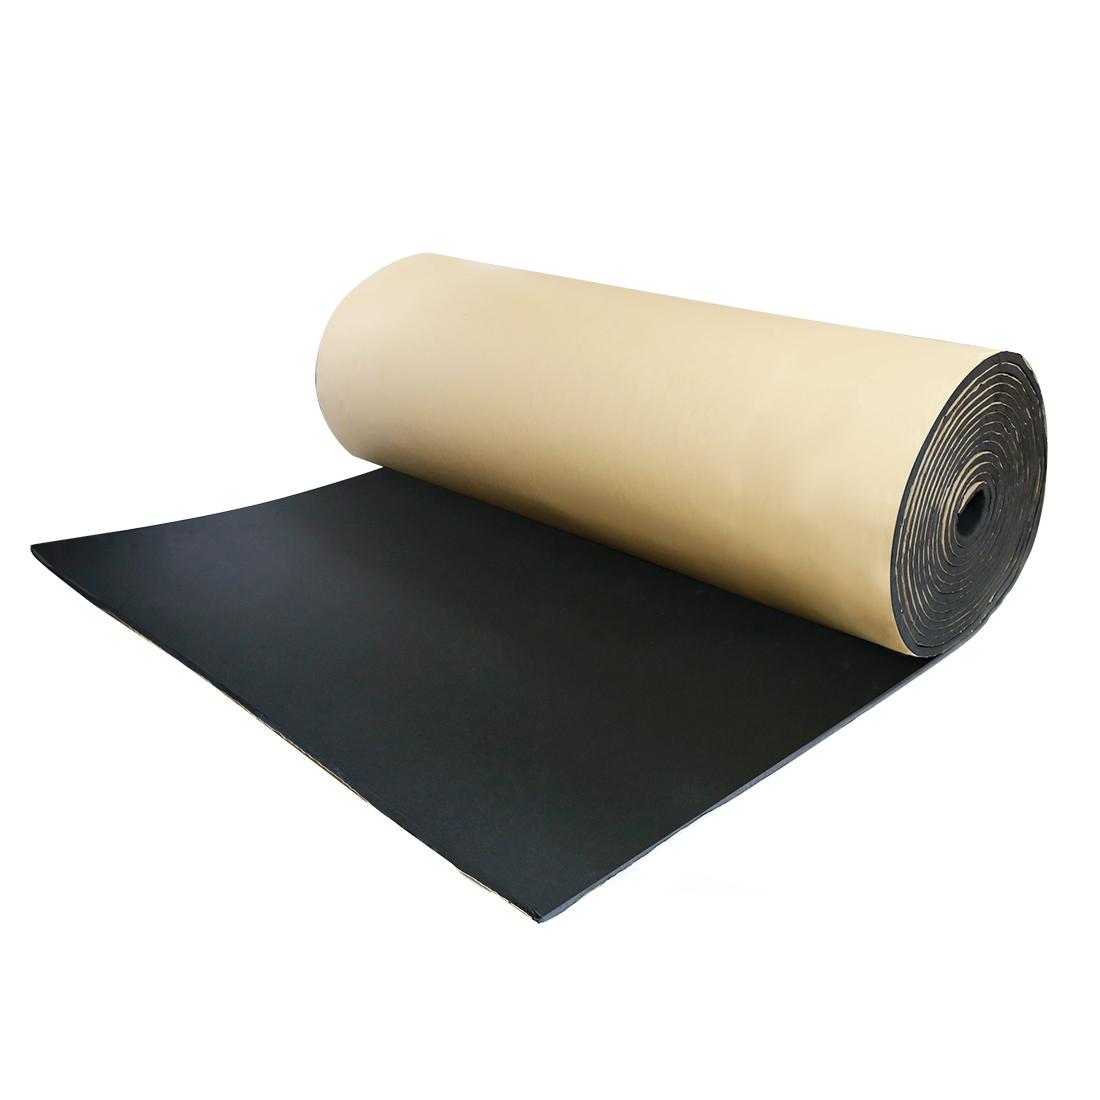 "394mil 10mm 10.76sqft Car Floor Tailgate Sound Insulation Deadener Mat 79"" x 20"""